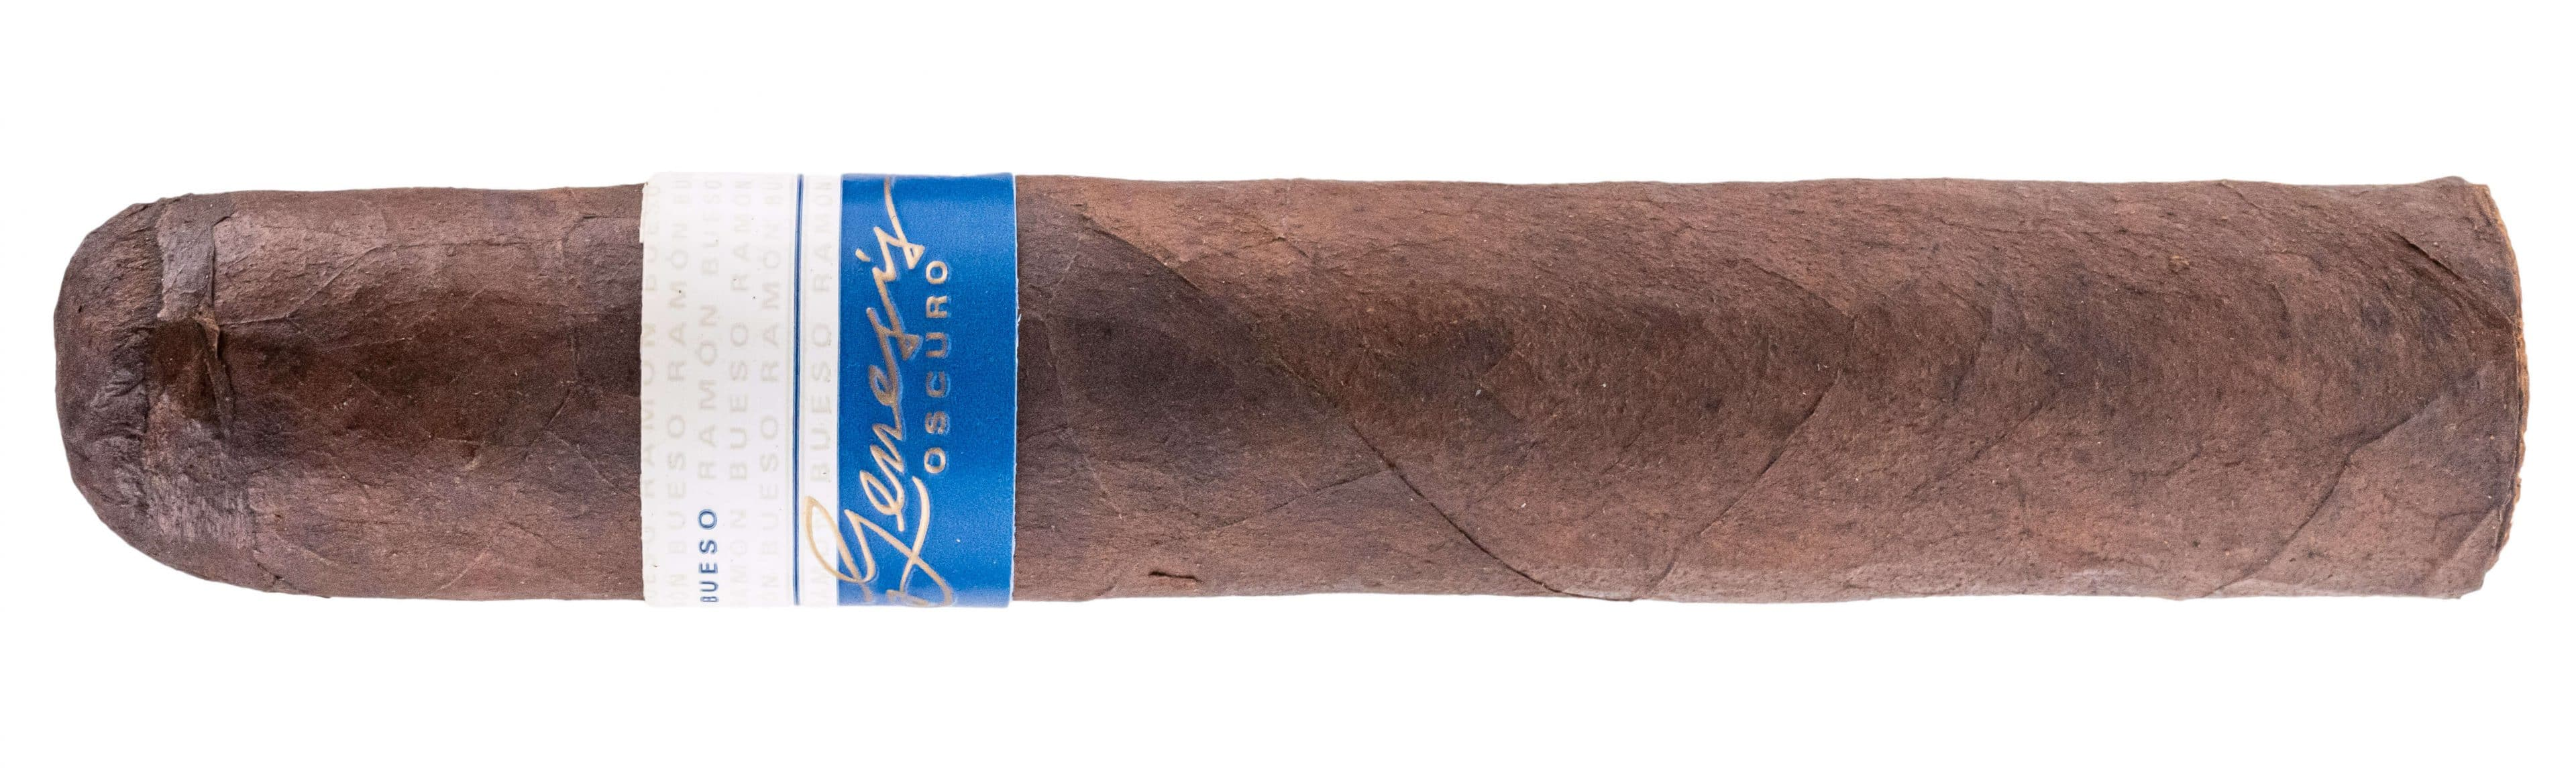 Blind Cigar Review: Ramon Bueso   Genesis Oscuro Robusto